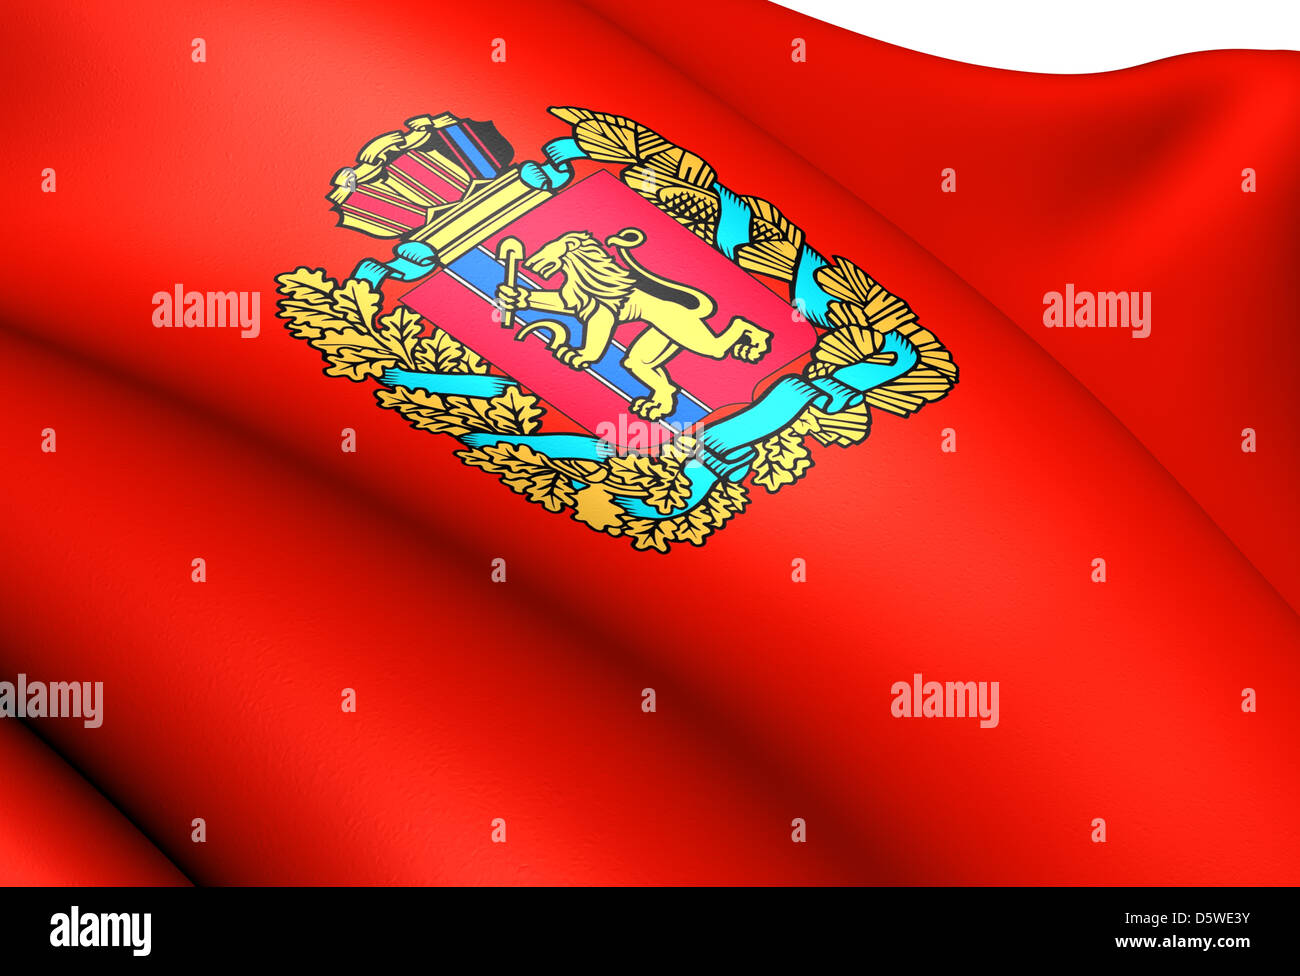 Флаг красноярска картинка, доброй ночи